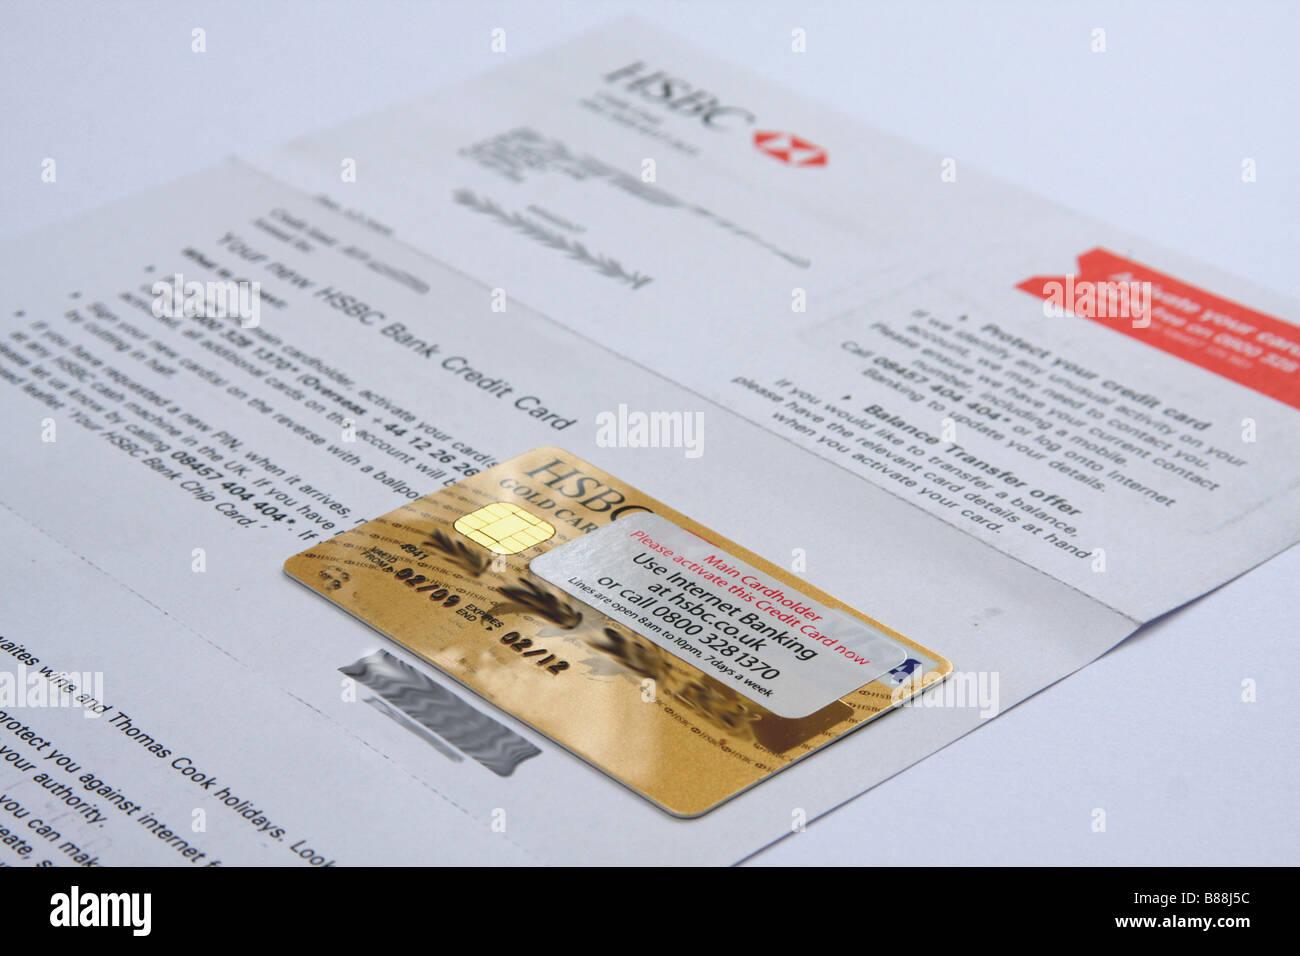 Card Credit Hsbc Nv Wiring Library Delphi Harness India Gold Visa Debit